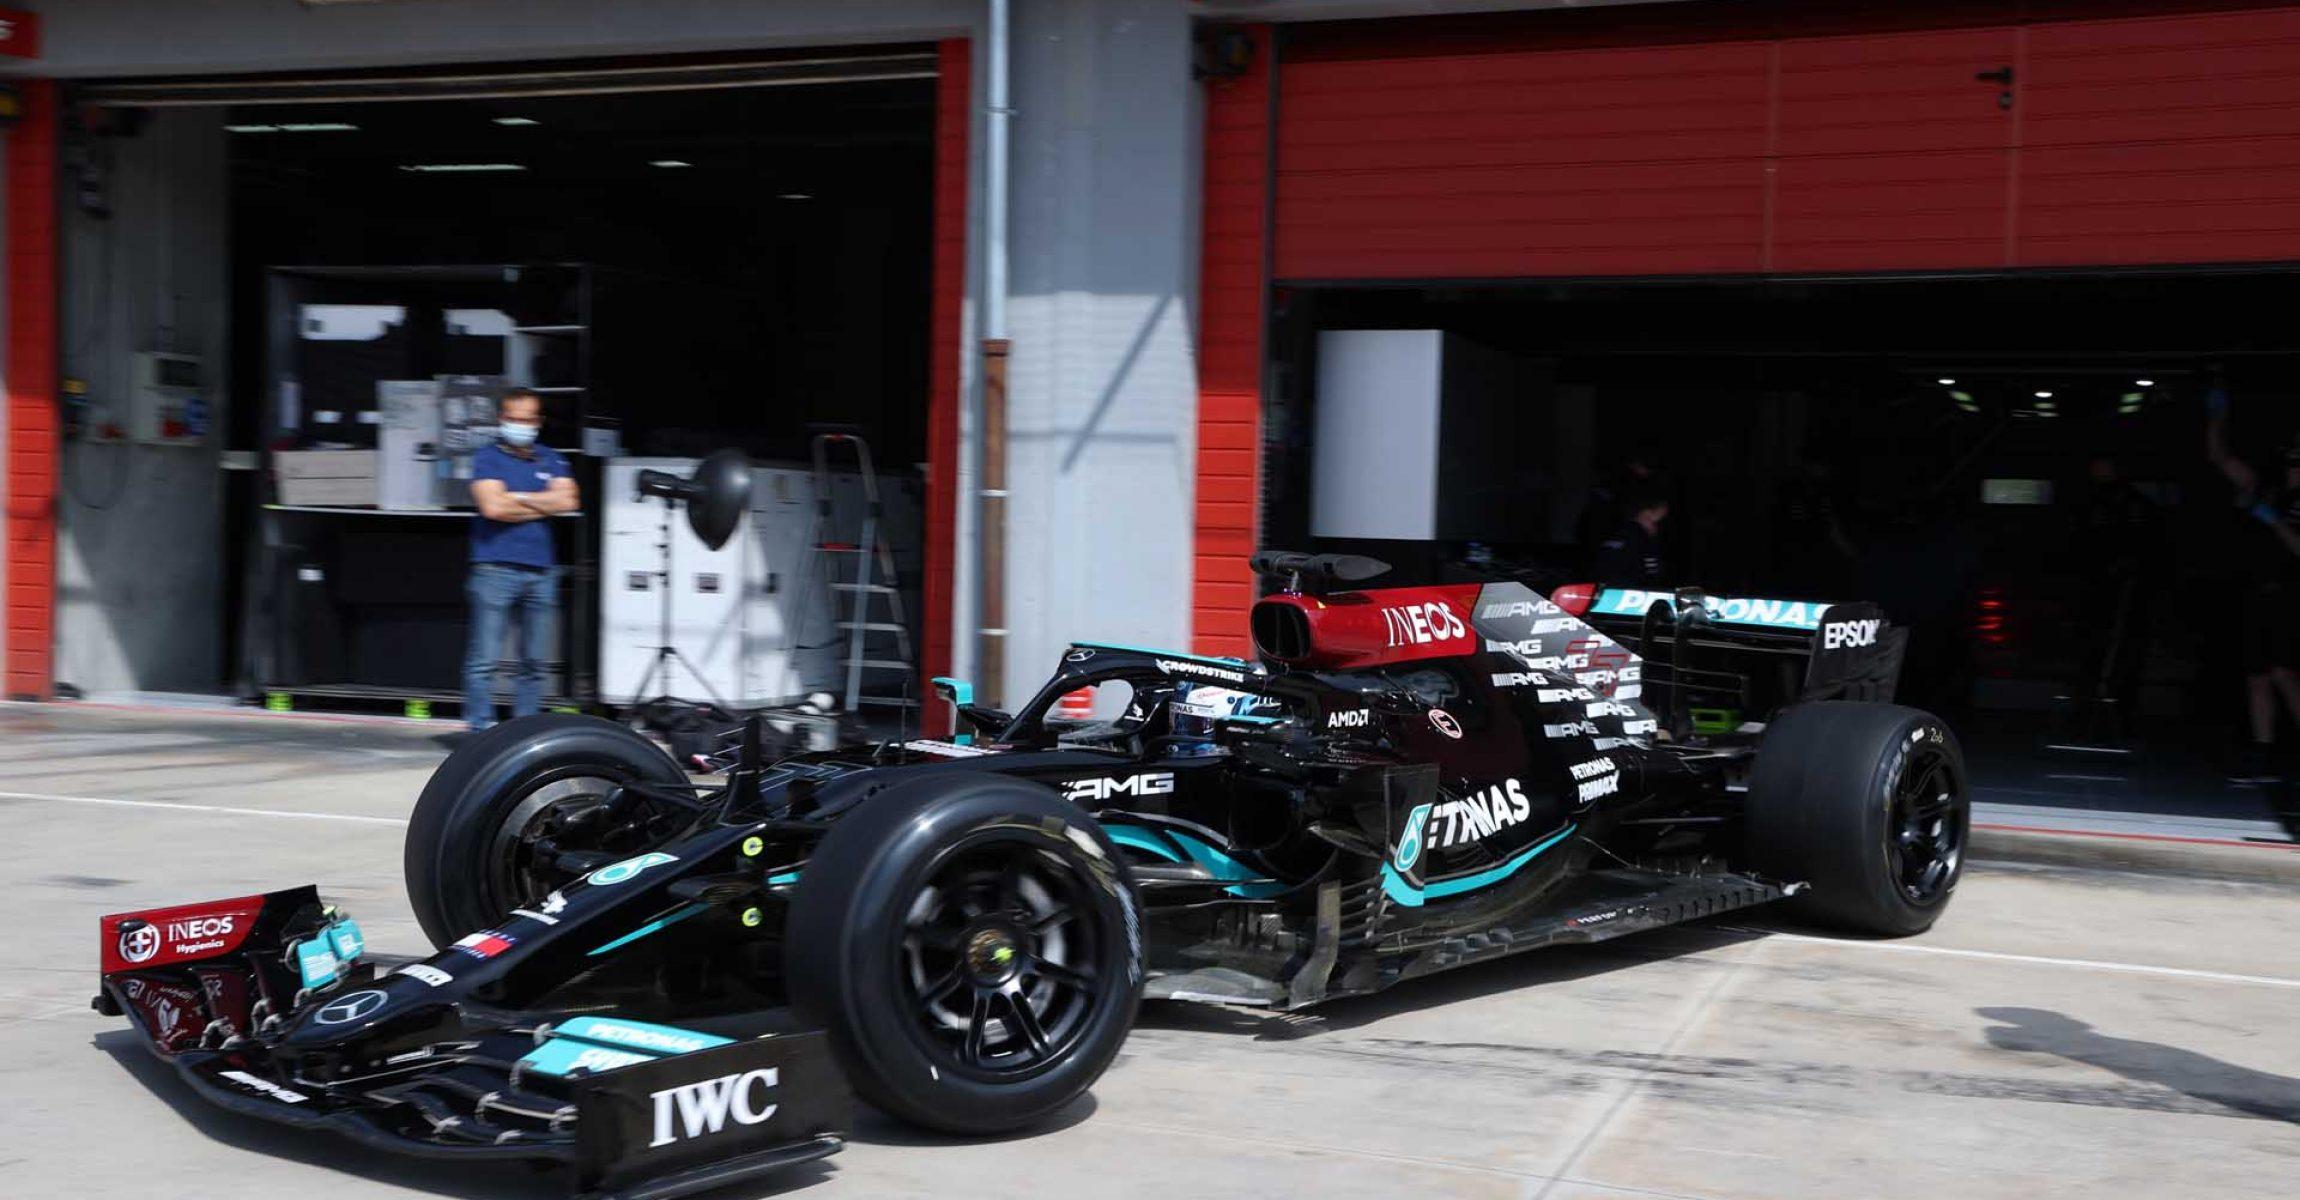 2021 Pirelli Tyre Test - Imola (Day 2) Valtteri Bottas Mercedes 18 inch tyre test